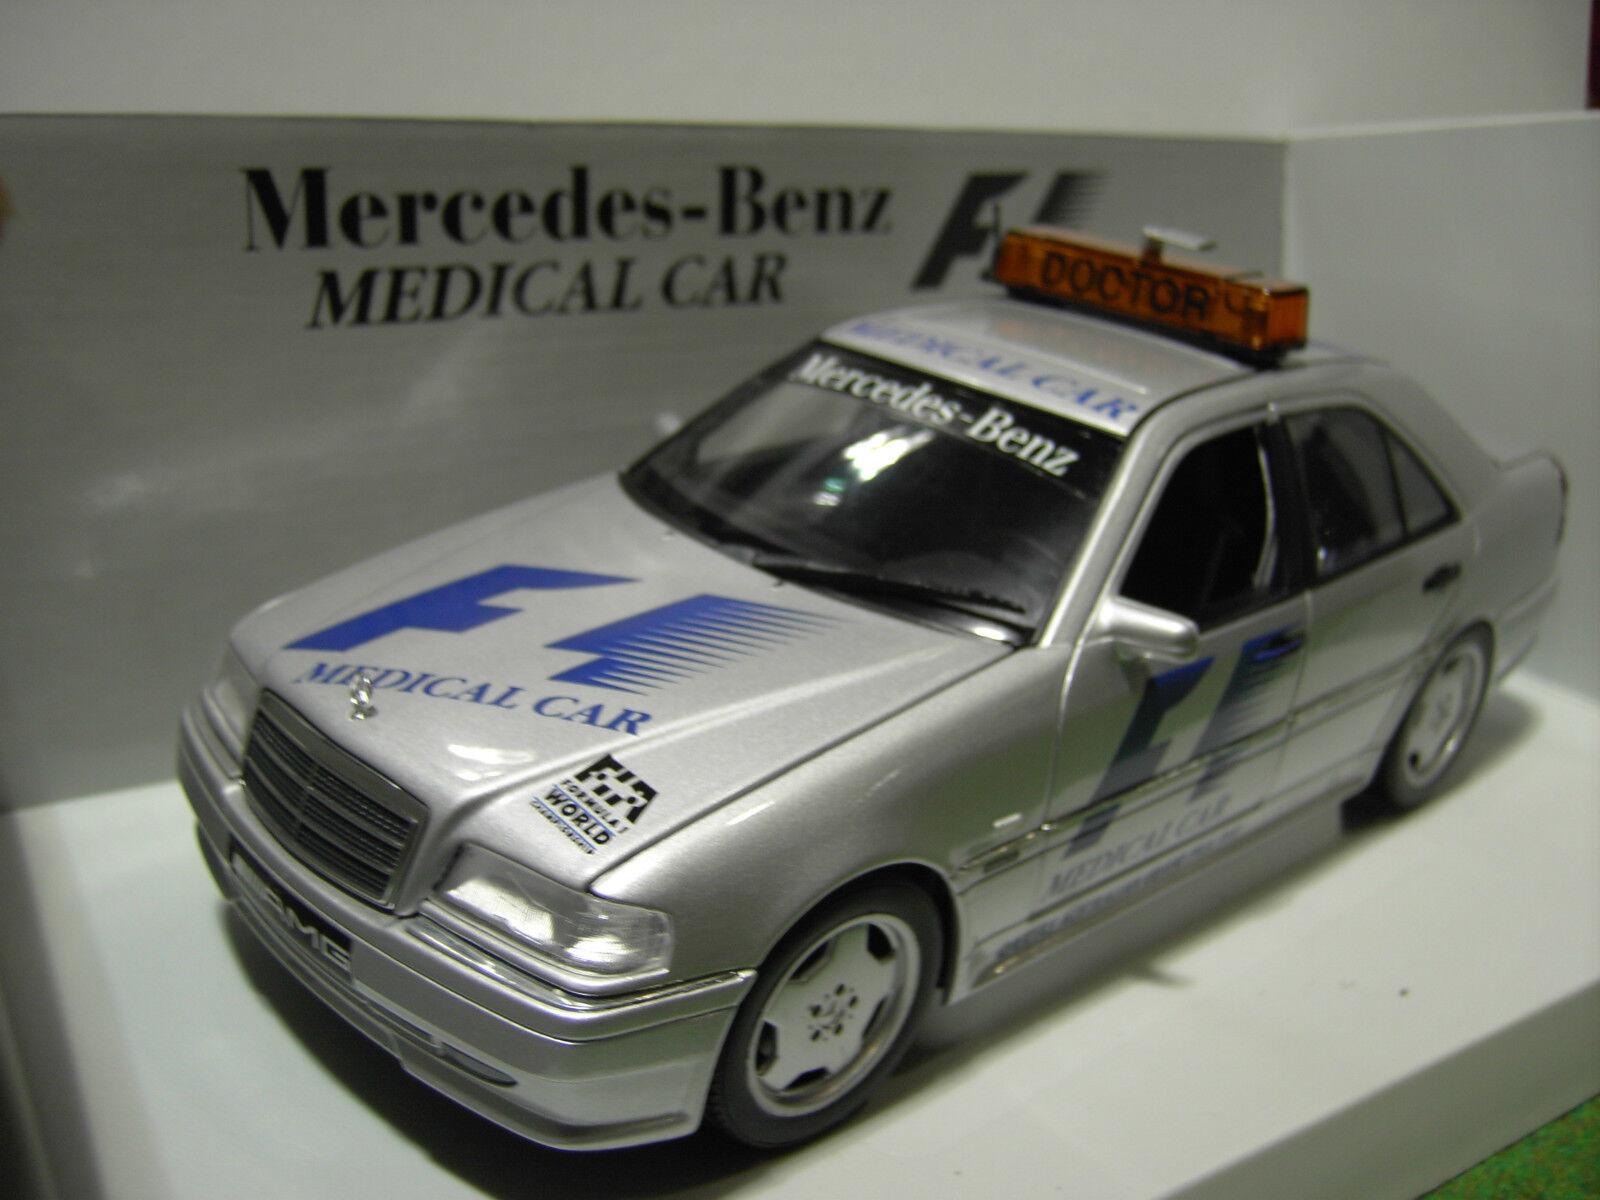 MERCEDES BENZ C CLASS AMG MEDICAL Coche au 1 18 UT Models 26106 voiture miniature